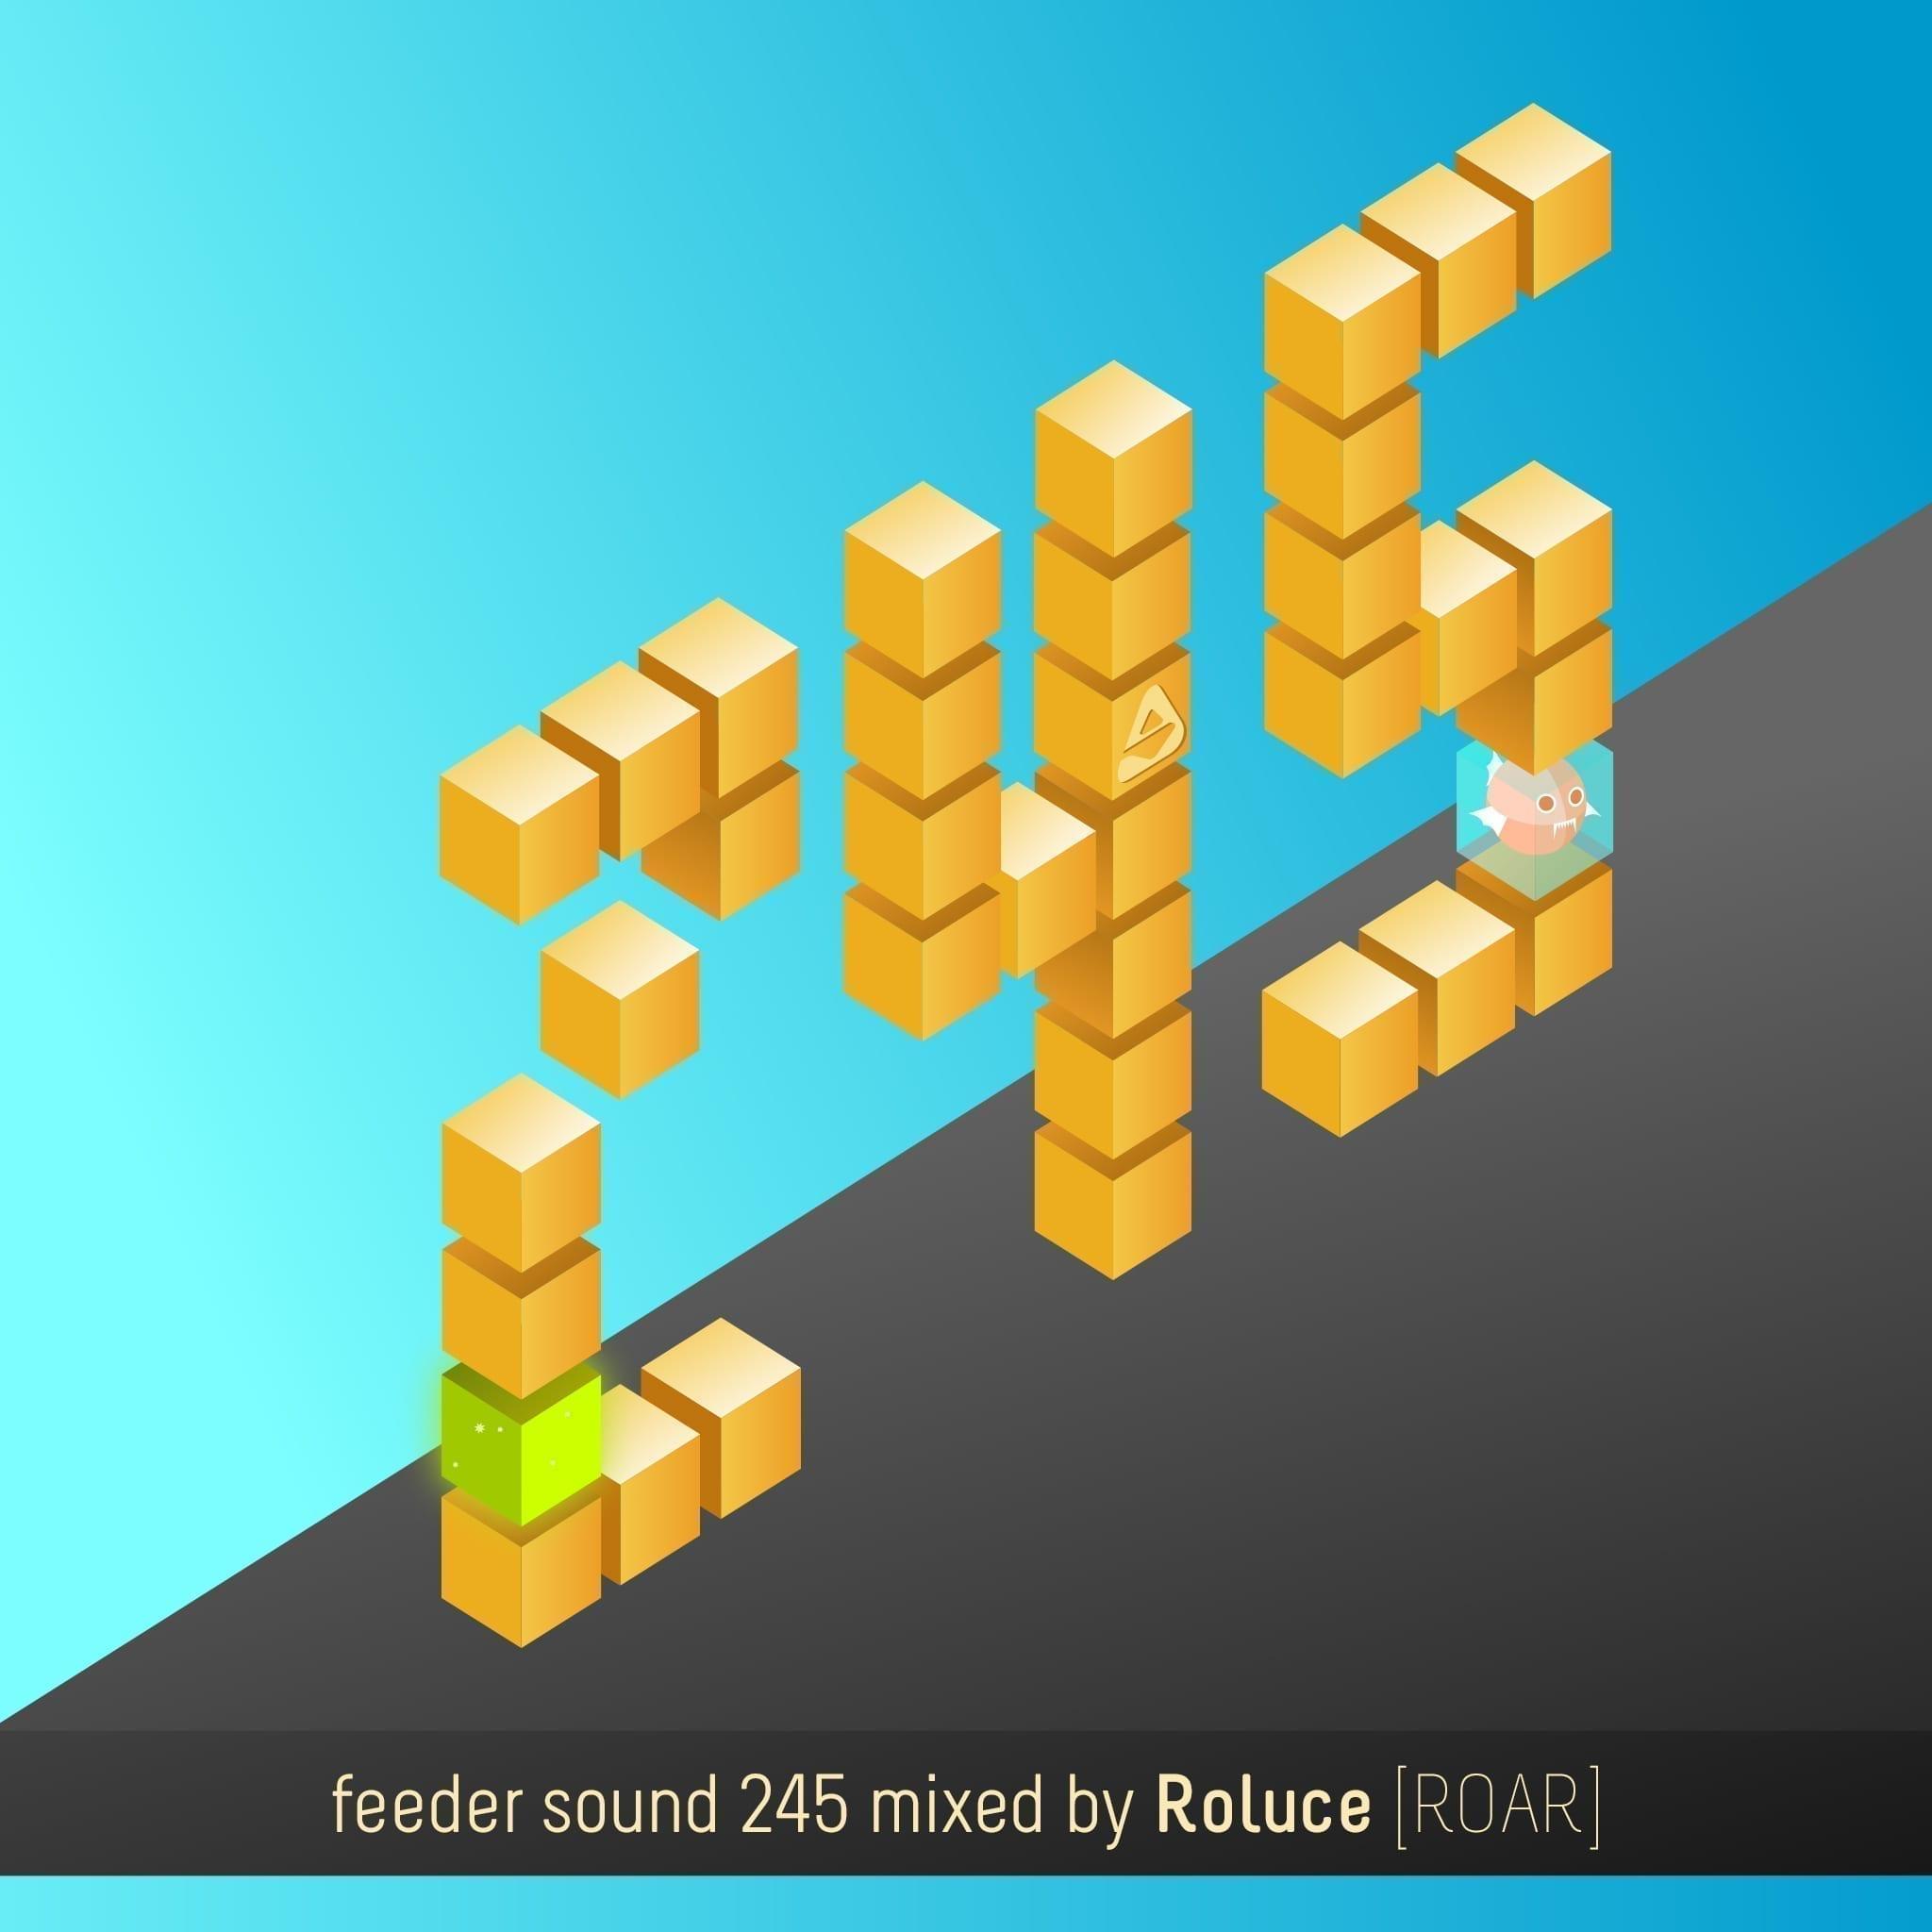 feeder sound 245 mixed by Roluce [ROAR] 01